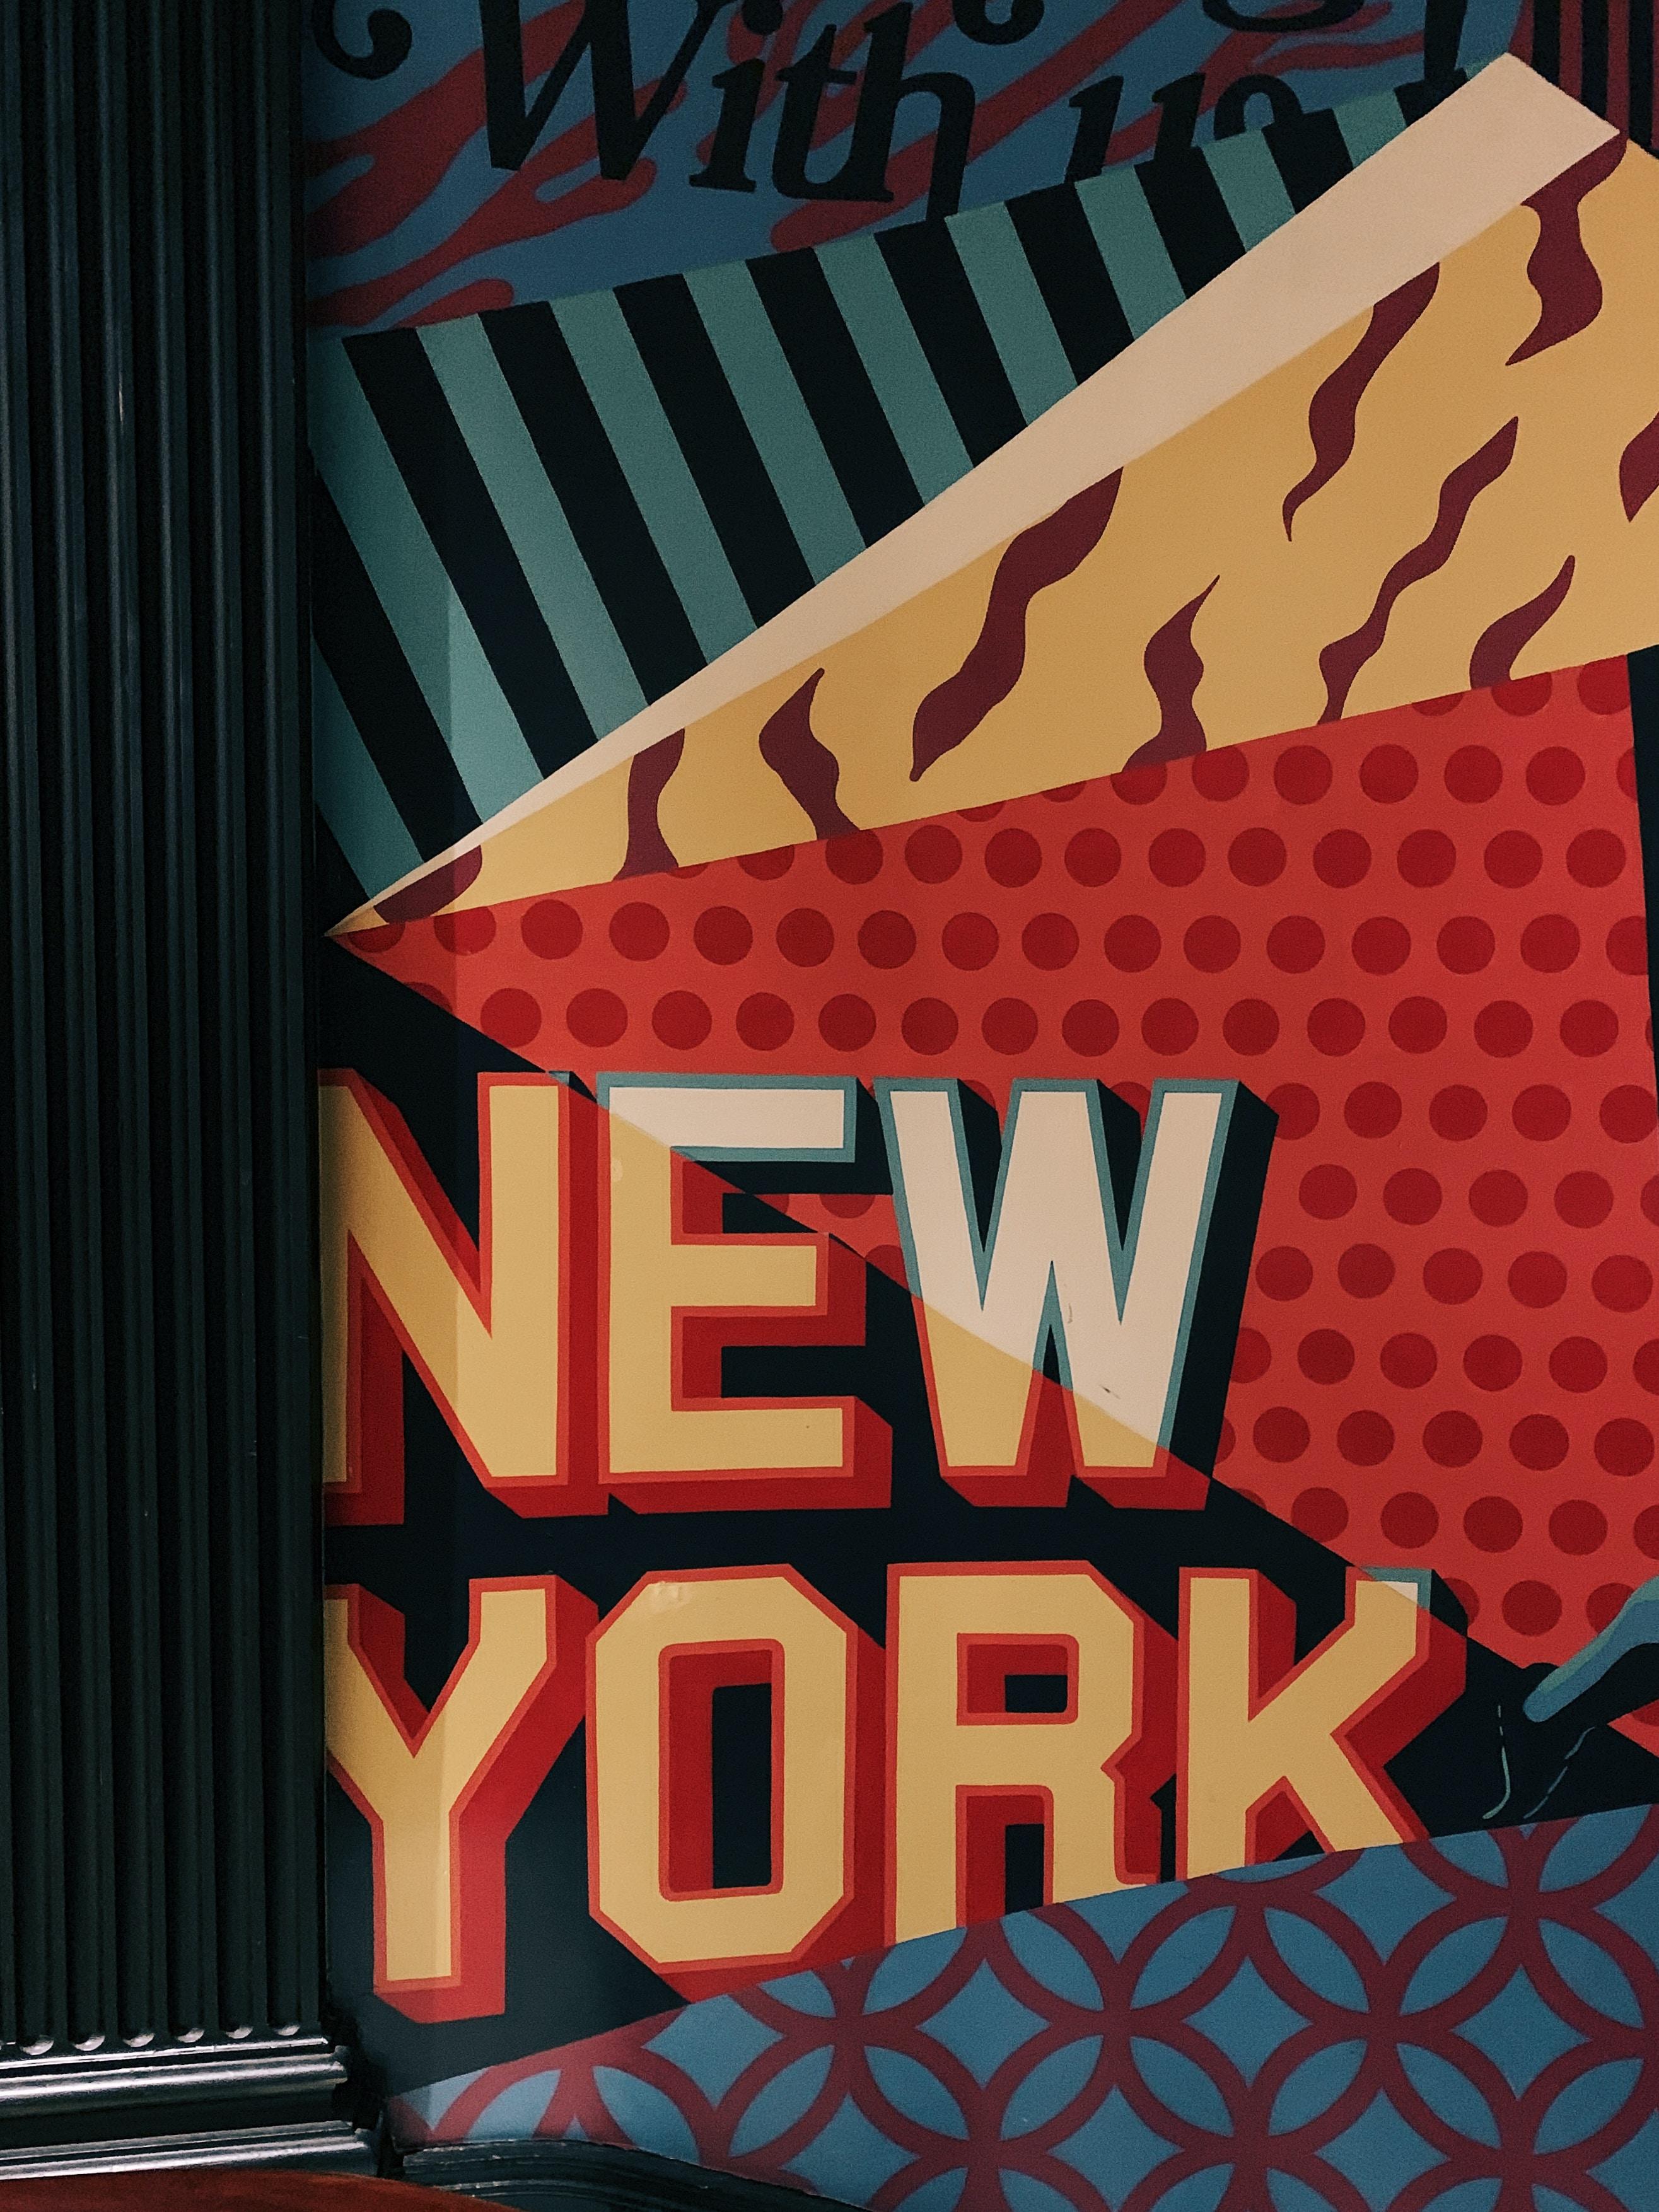 New York text